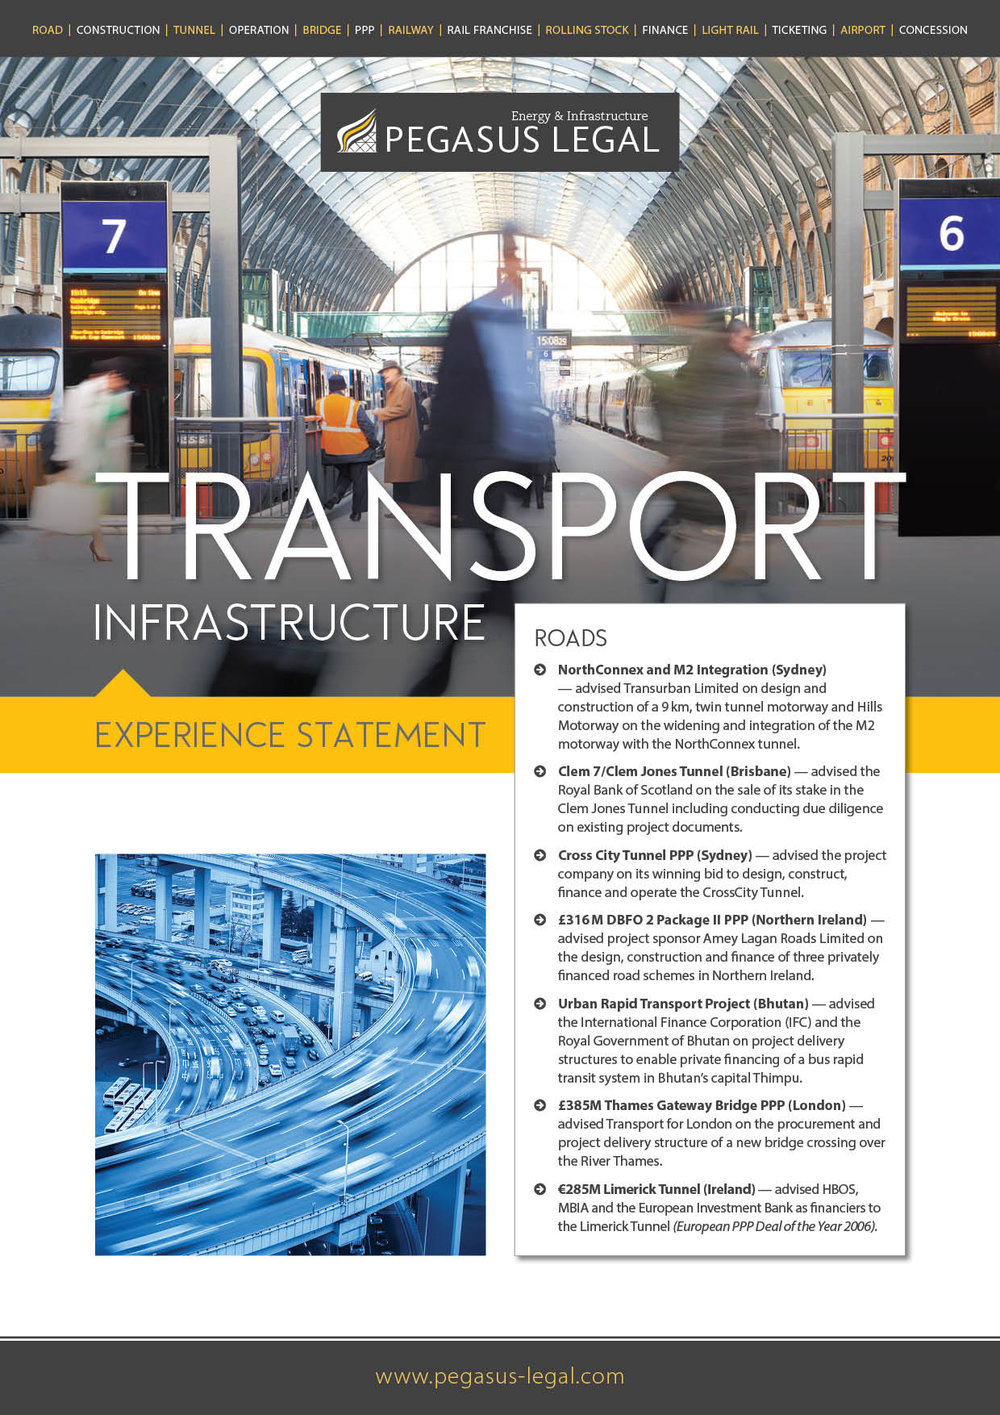 Transport Infrastructure_for website.jpg